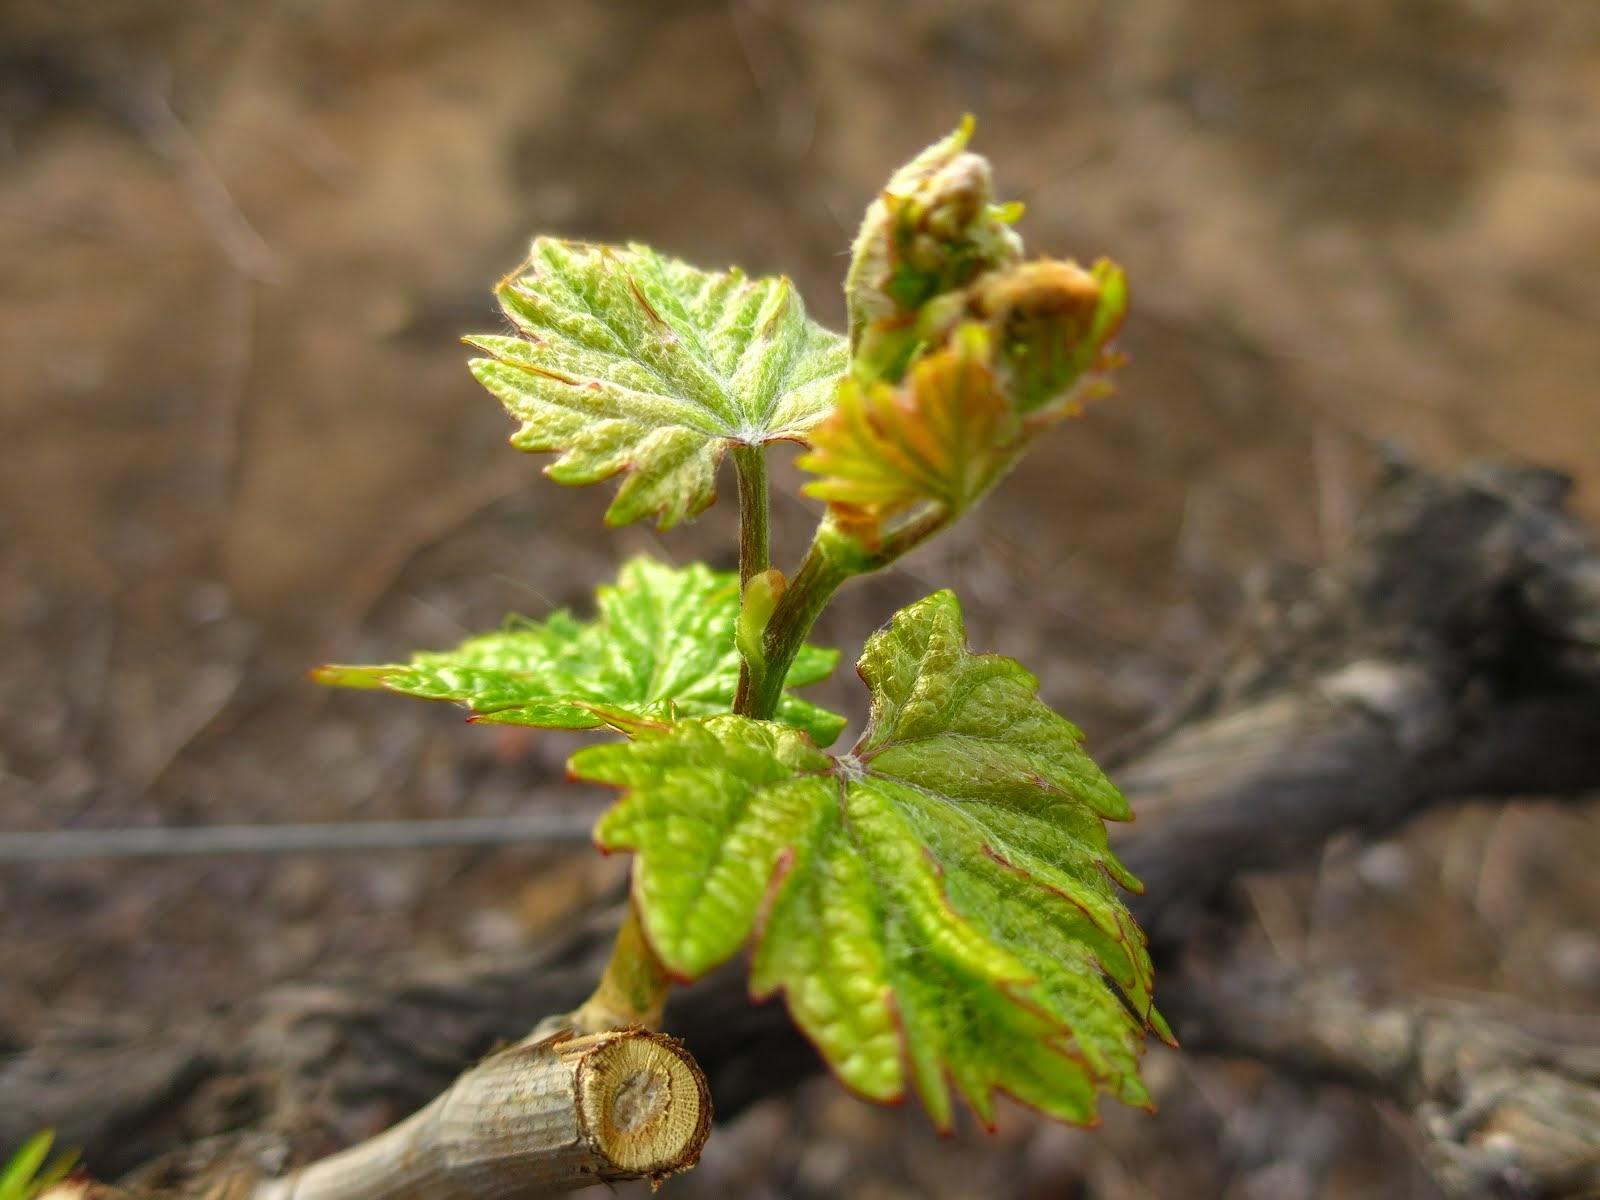 Bud break in the vineyards